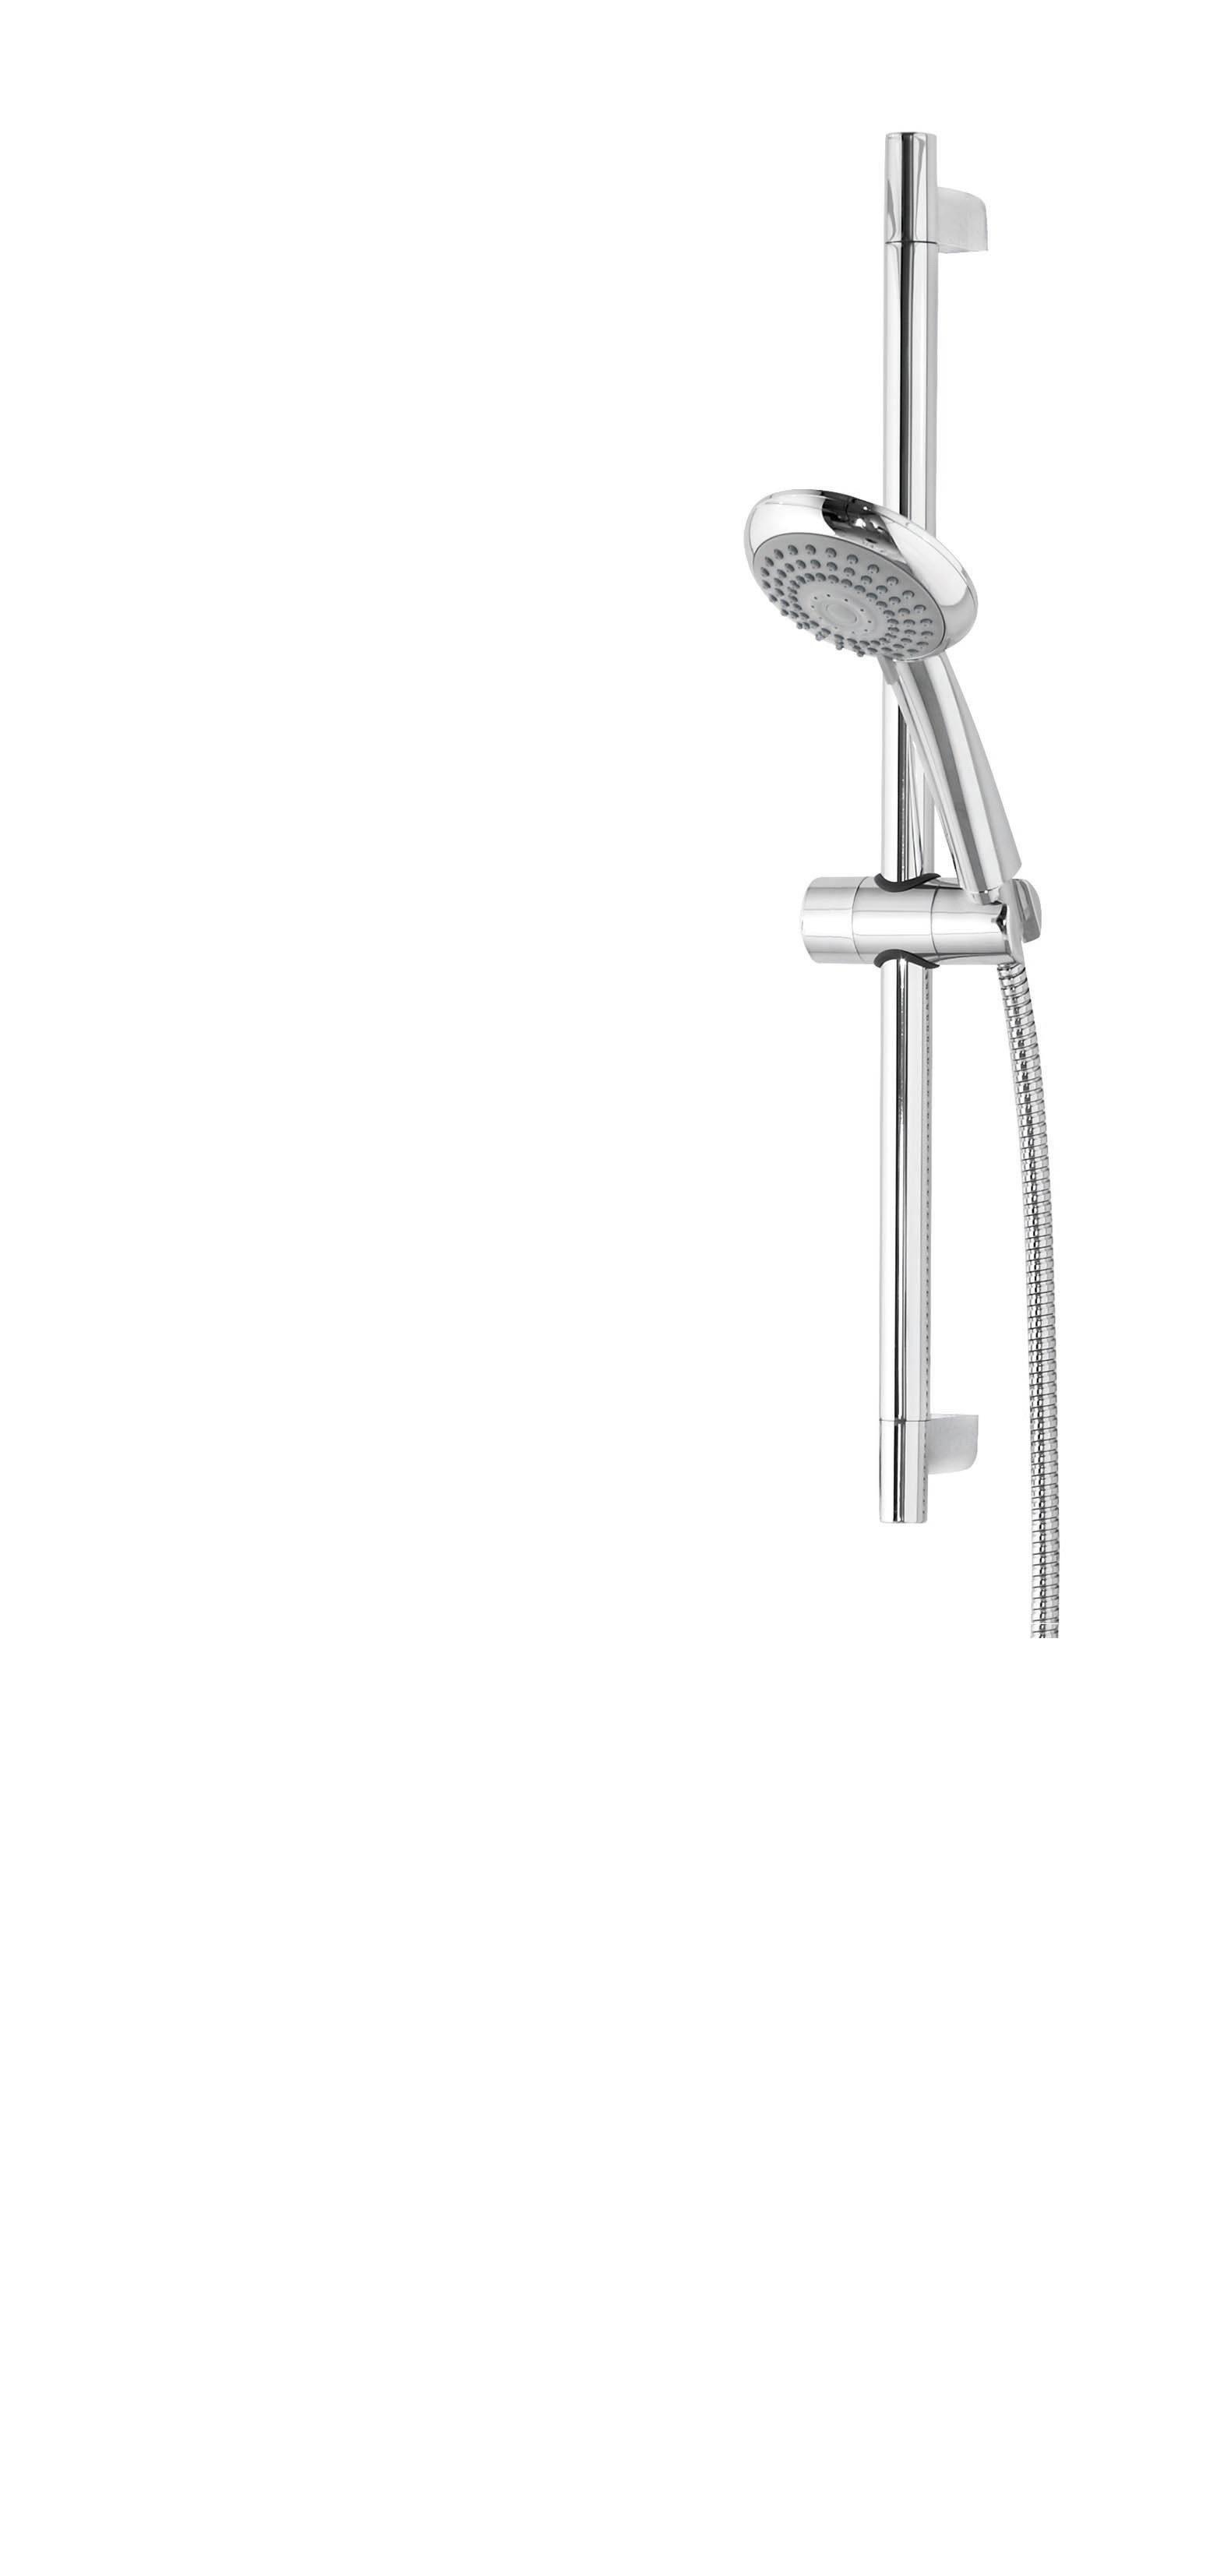 Schulte Set: Sanitärarmaturenzubehör »Classic«